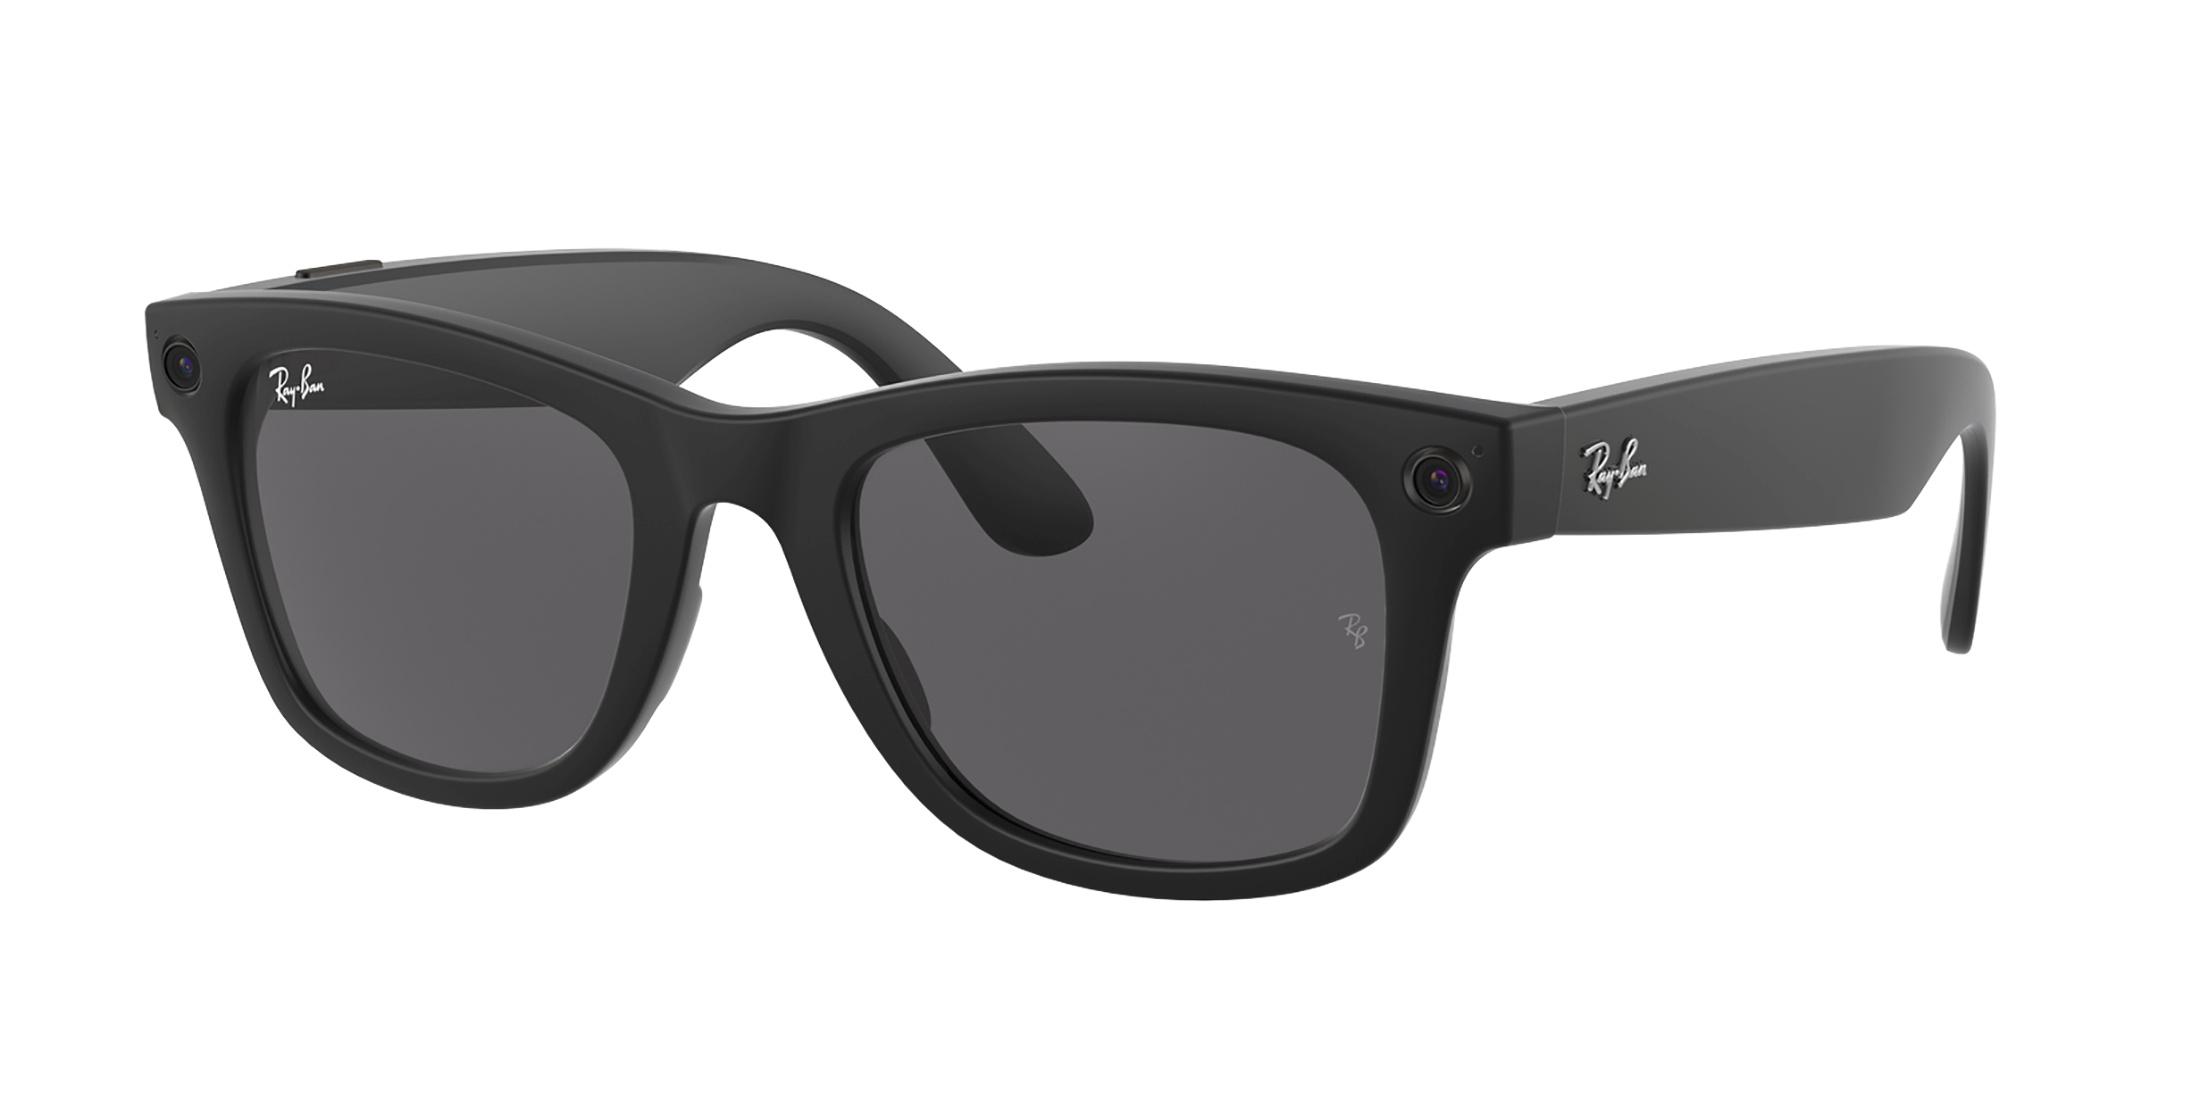 Facebook και Ray-Ban κυκλοφόρησαν τα πρώτα «έξυπνα» γυαλιά: Ακούς μουσική, βγάζεις φωτογραφίες και ποστάρεις